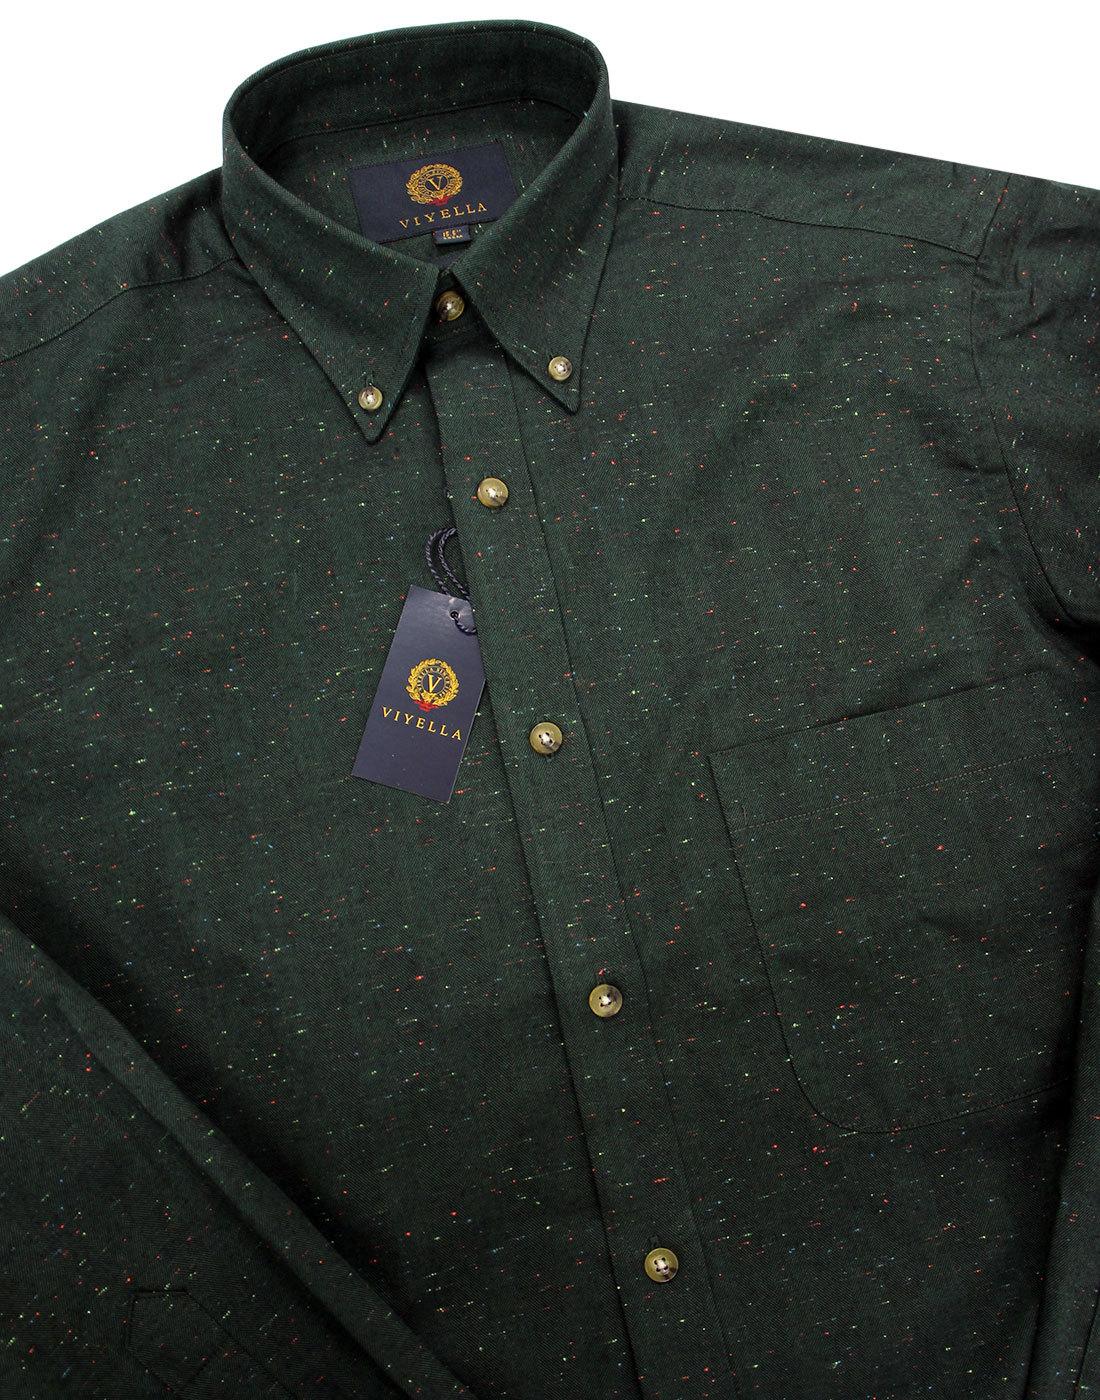 Ongebruikt VIYELLA Retro Mod Button Down Herringbone Donegal Nep Shirt Green ES-97